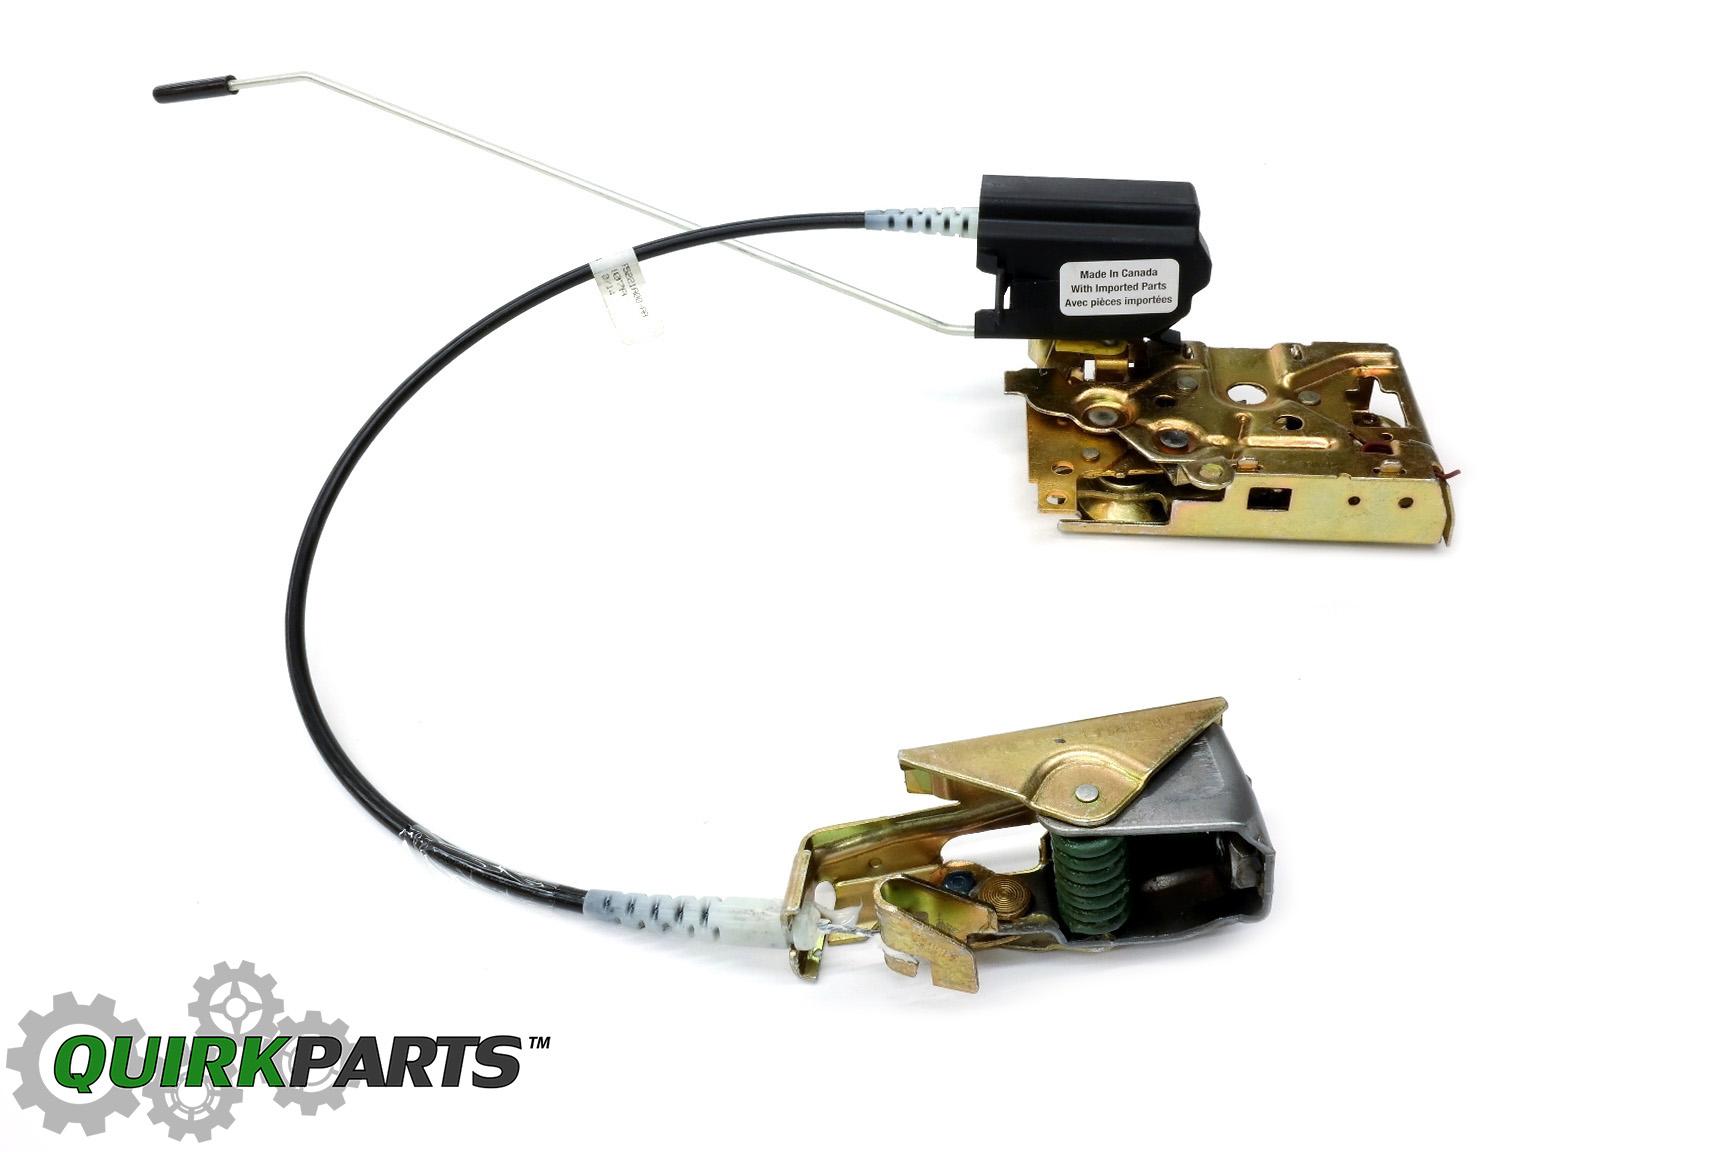 1993 Ford F150 Door Diagram Trusted Schematics F 150 Wire Tailgate Parts Wiring Lock